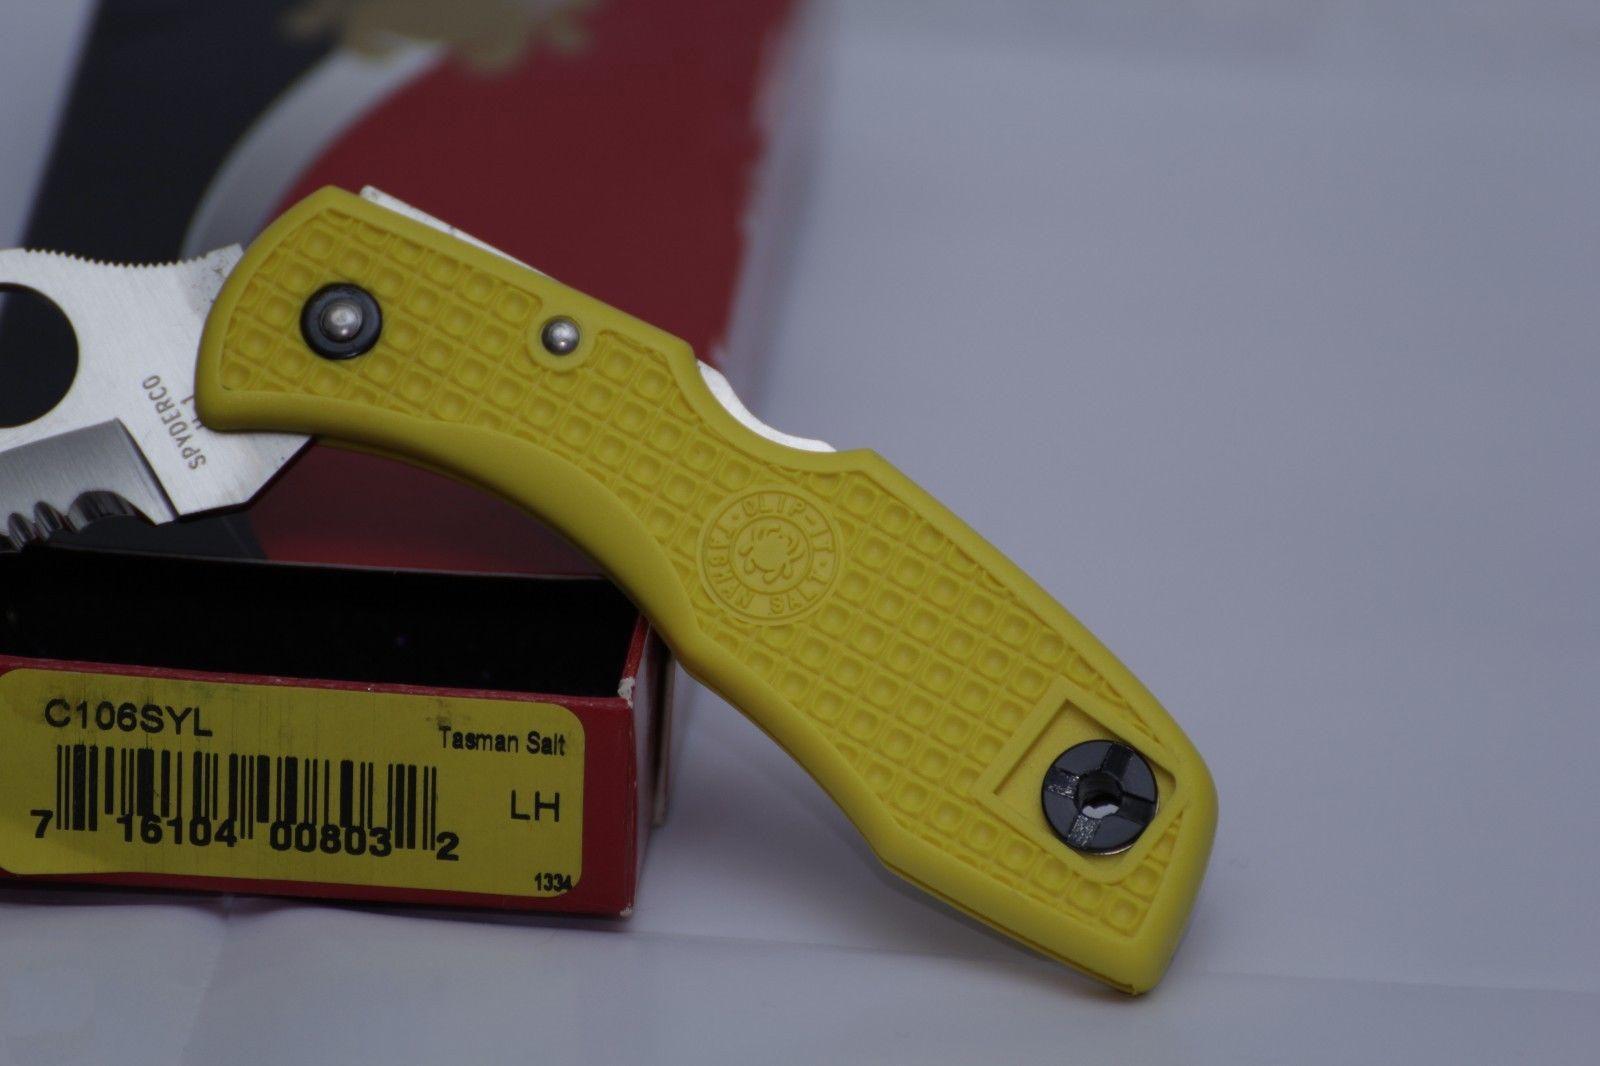 Фото 11 - Нож складной Tasman Salt™ Spyderco 106SYL, сталь H1 Satin Serrated, рукоять термопластик FRN, жёлтый